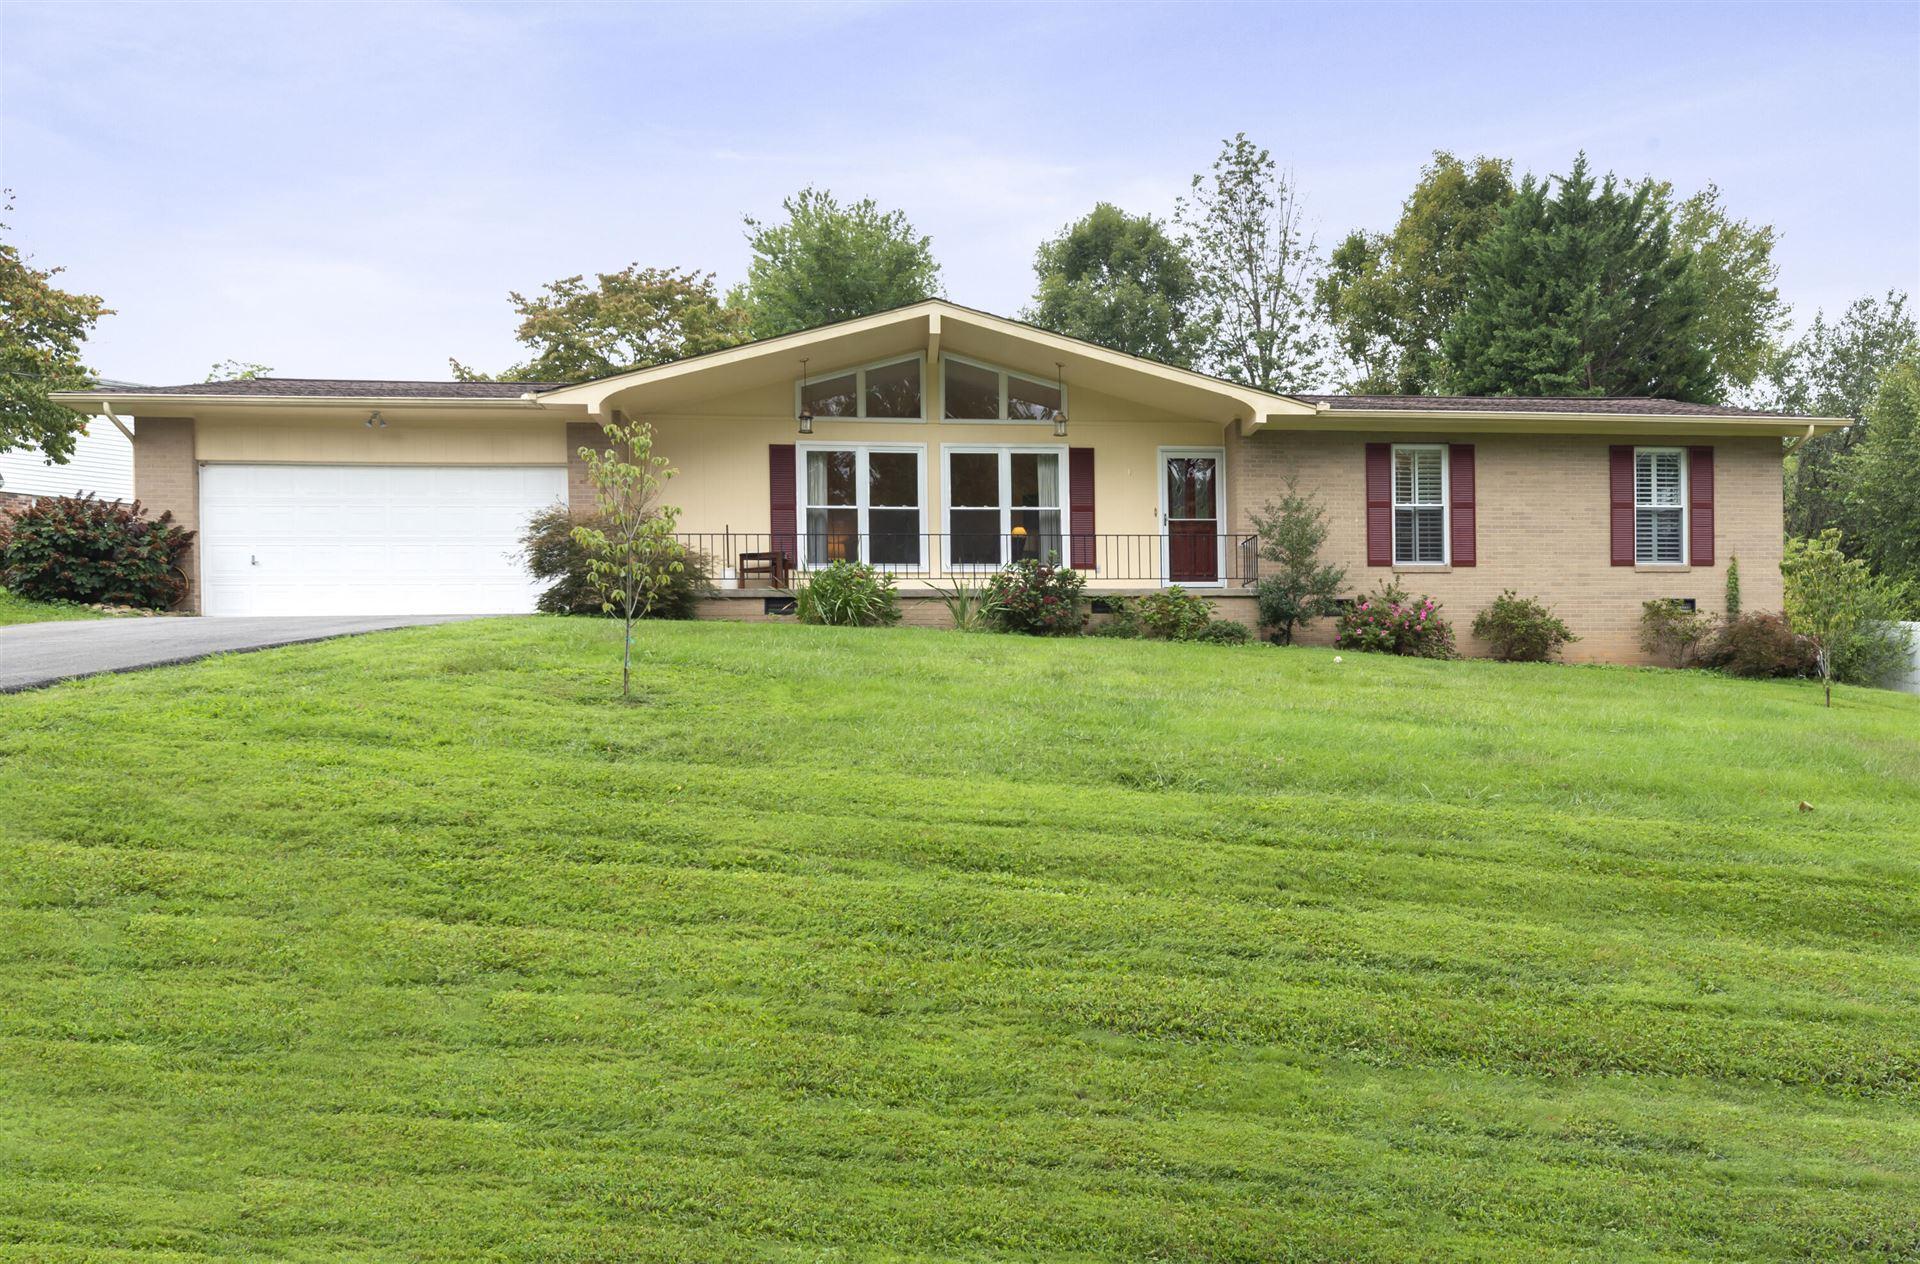 Photo of 120 Cooper Circle, Oak Ridge, TN 37830 (MLS # 1167679)